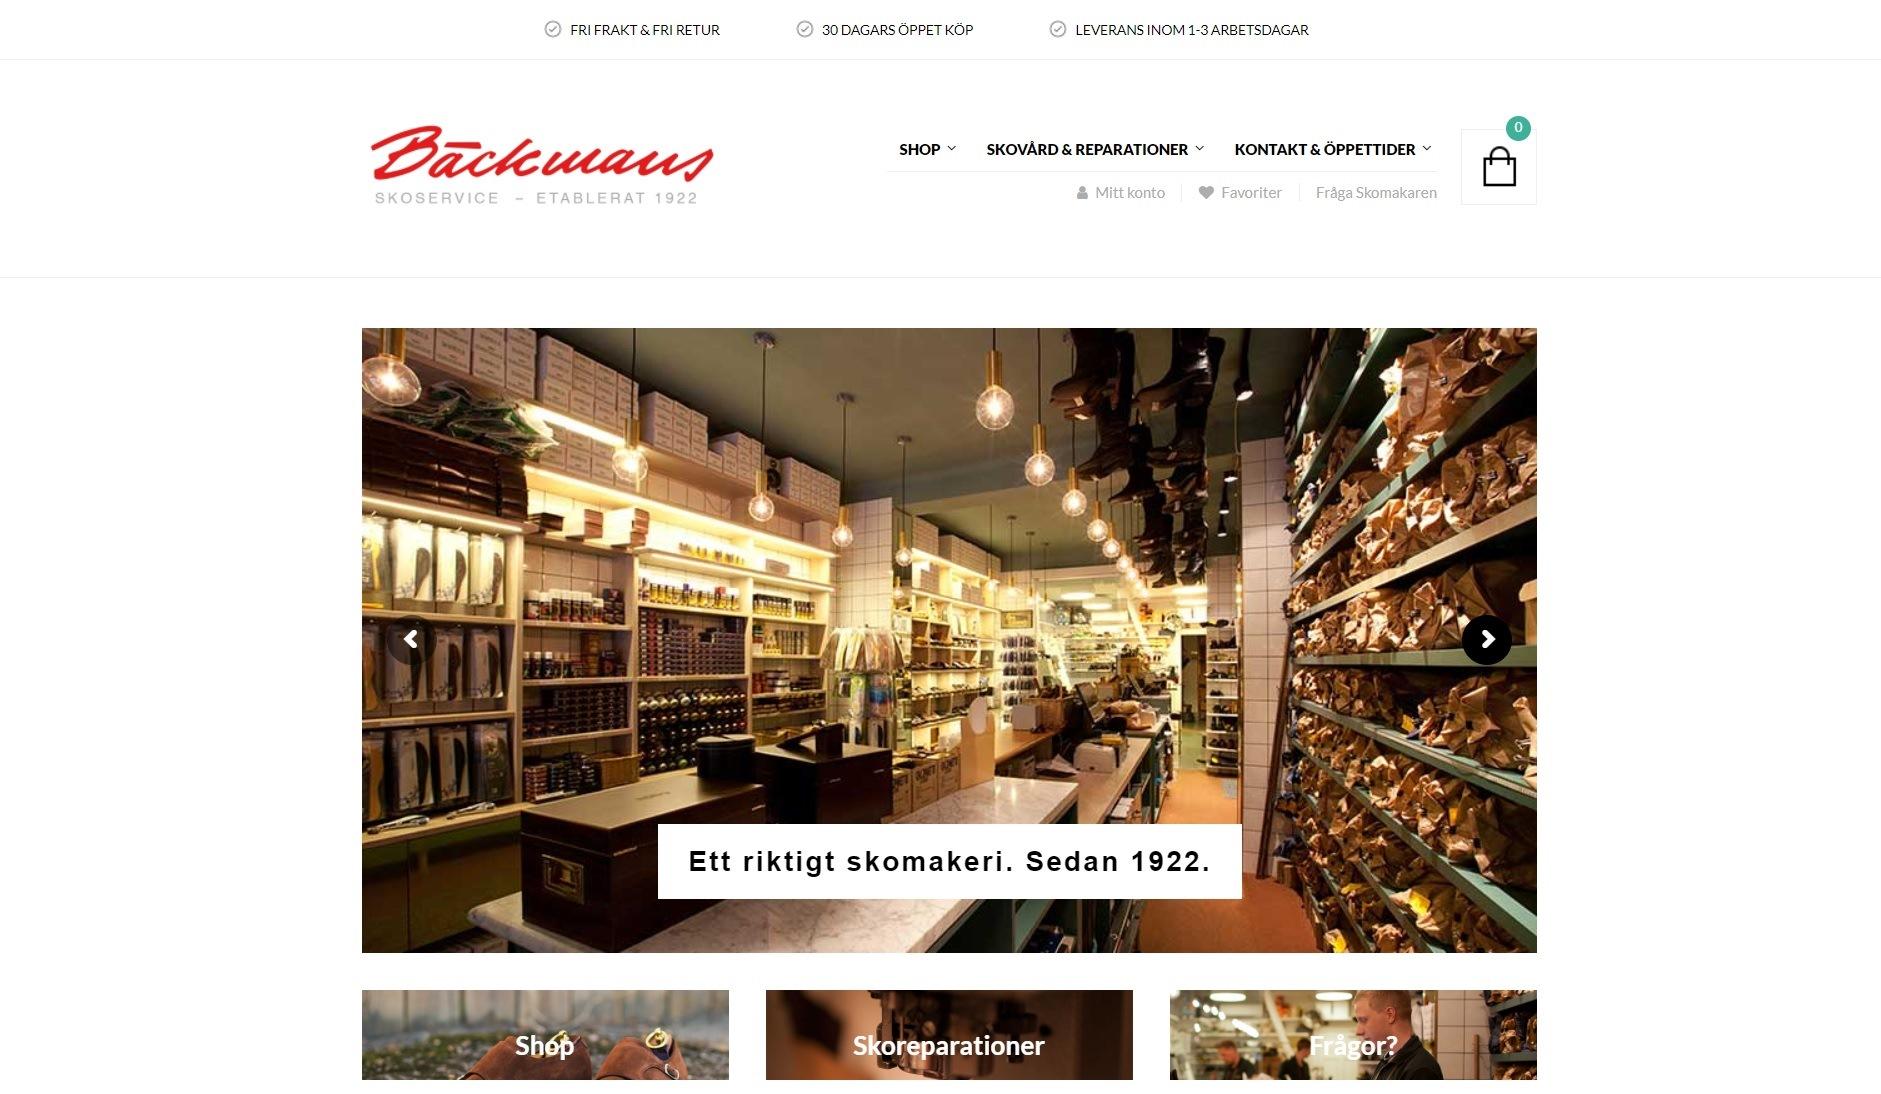 Best clothing stores in Stockholm - Bäckmans Skoservice